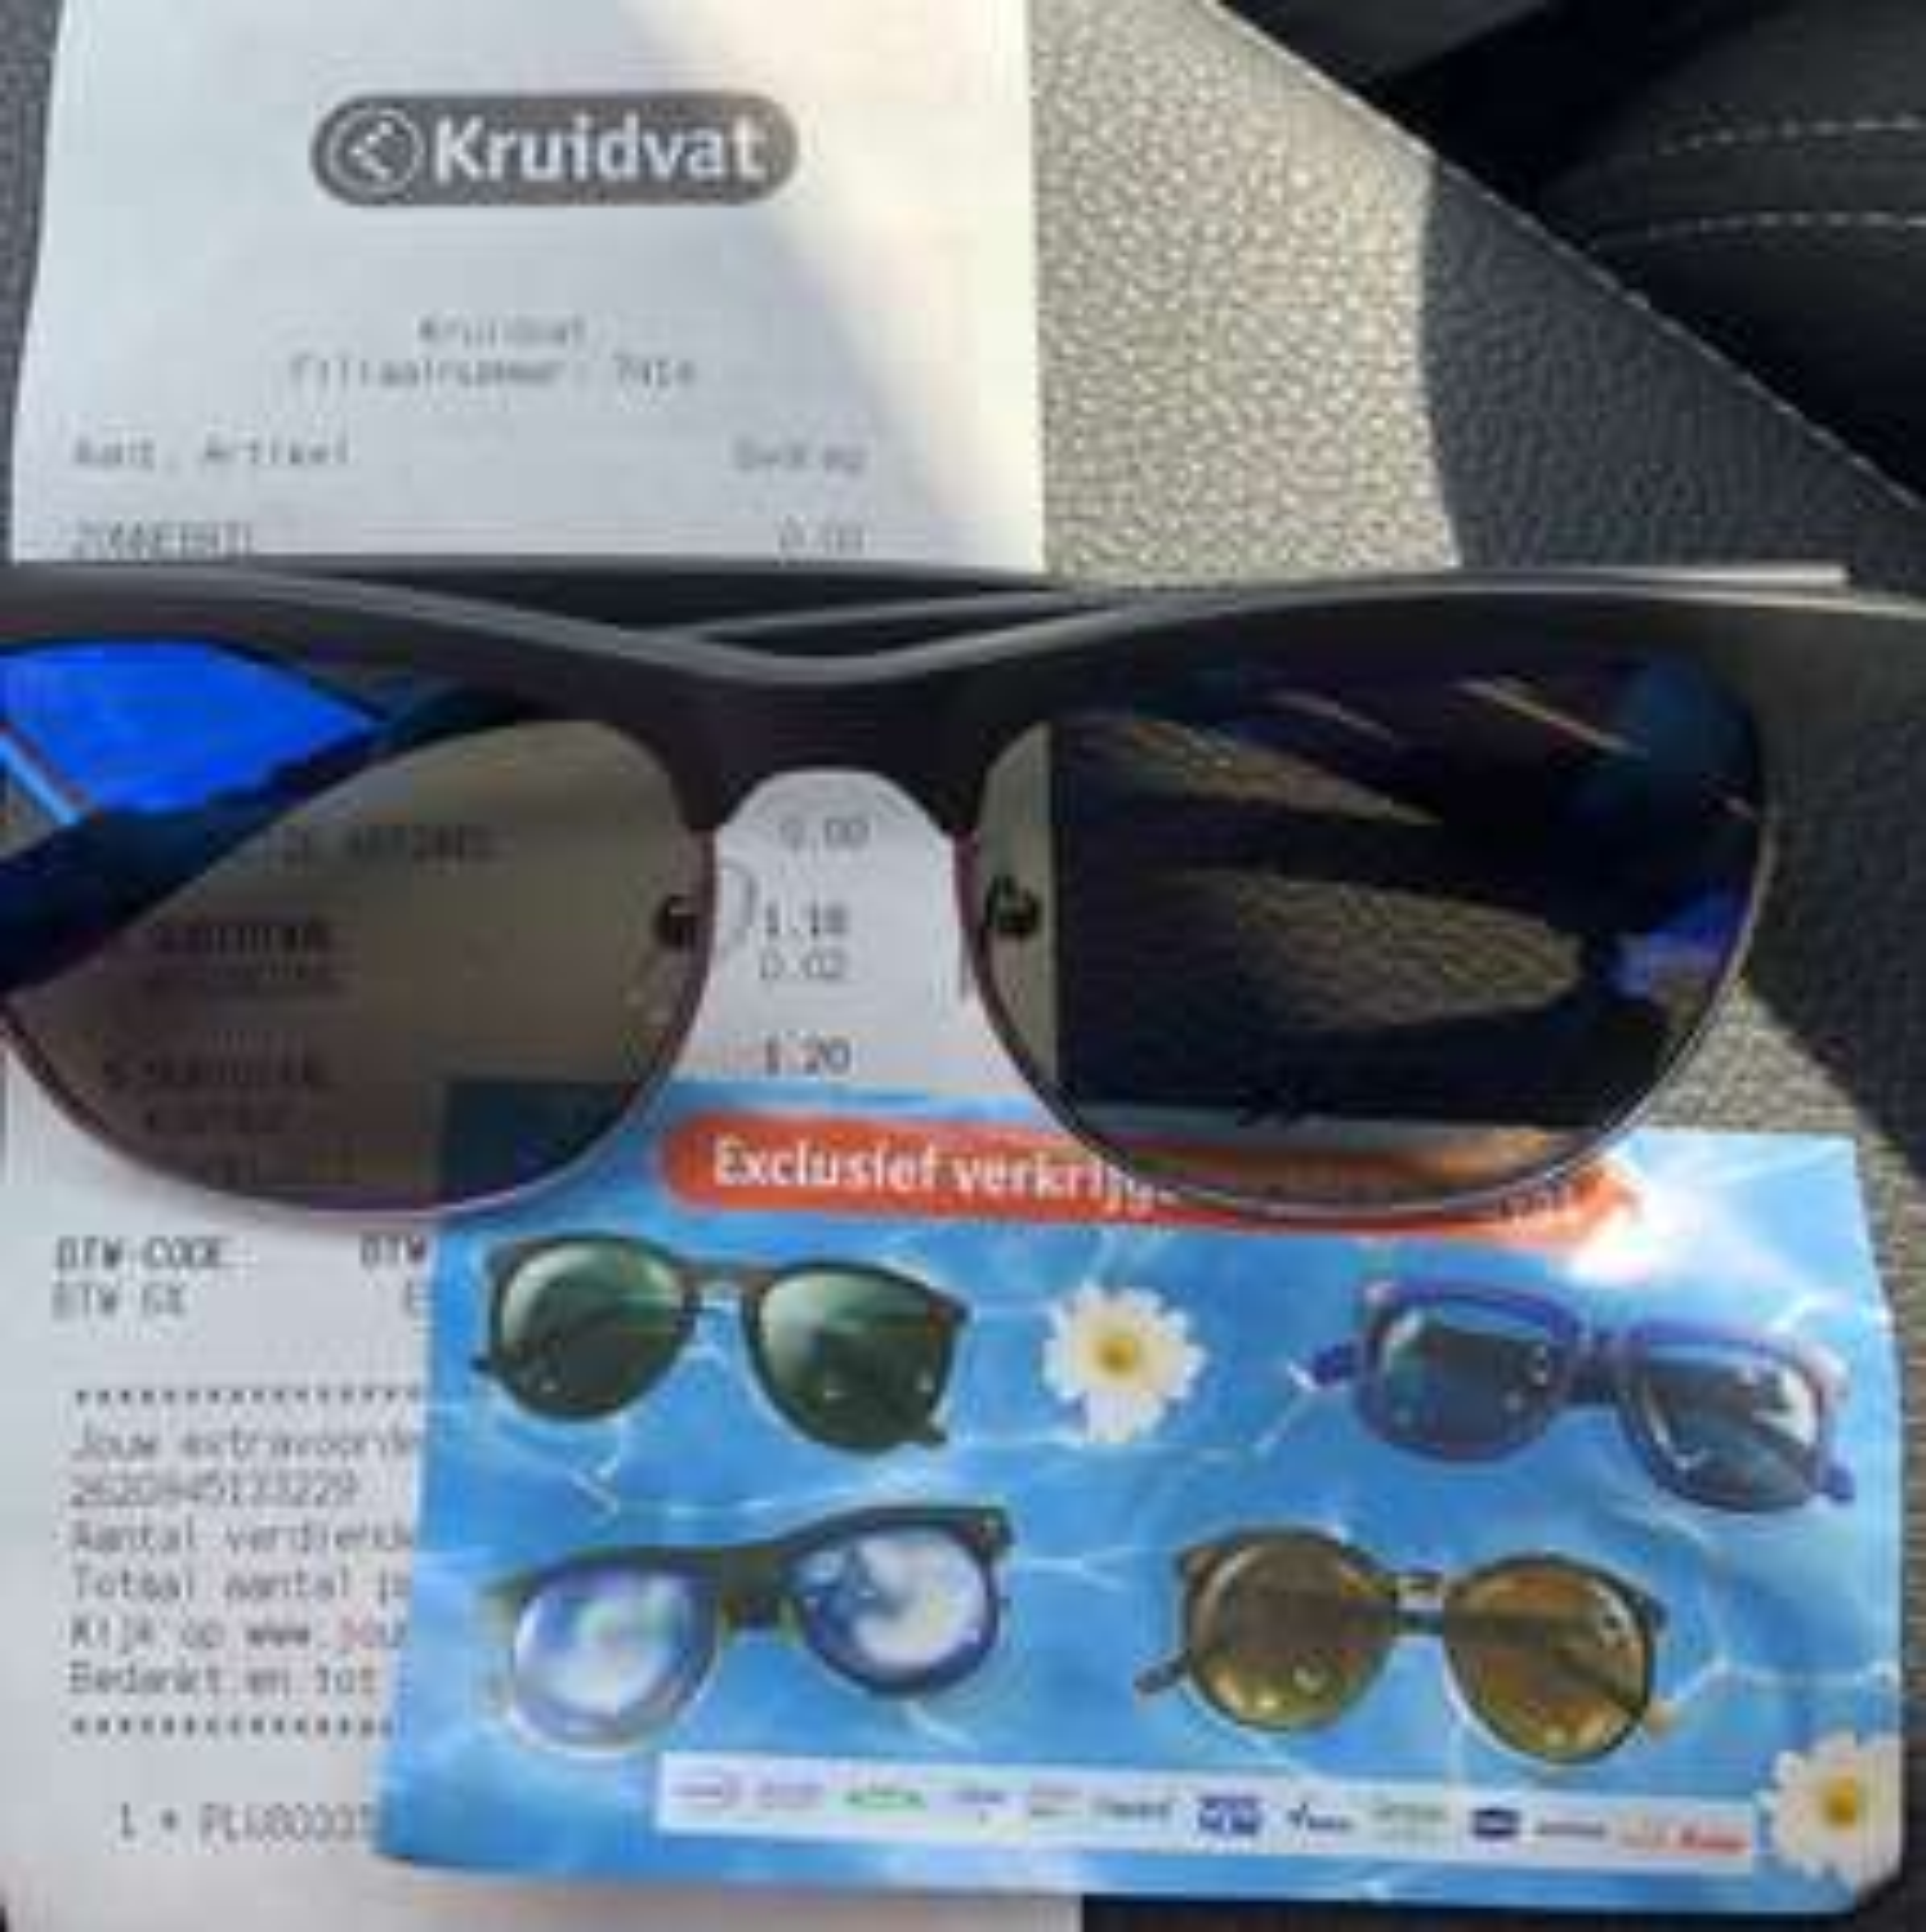 Gratis zonnebril t.w.v. €9,99 voor alle betalende klanten @Kruidvat